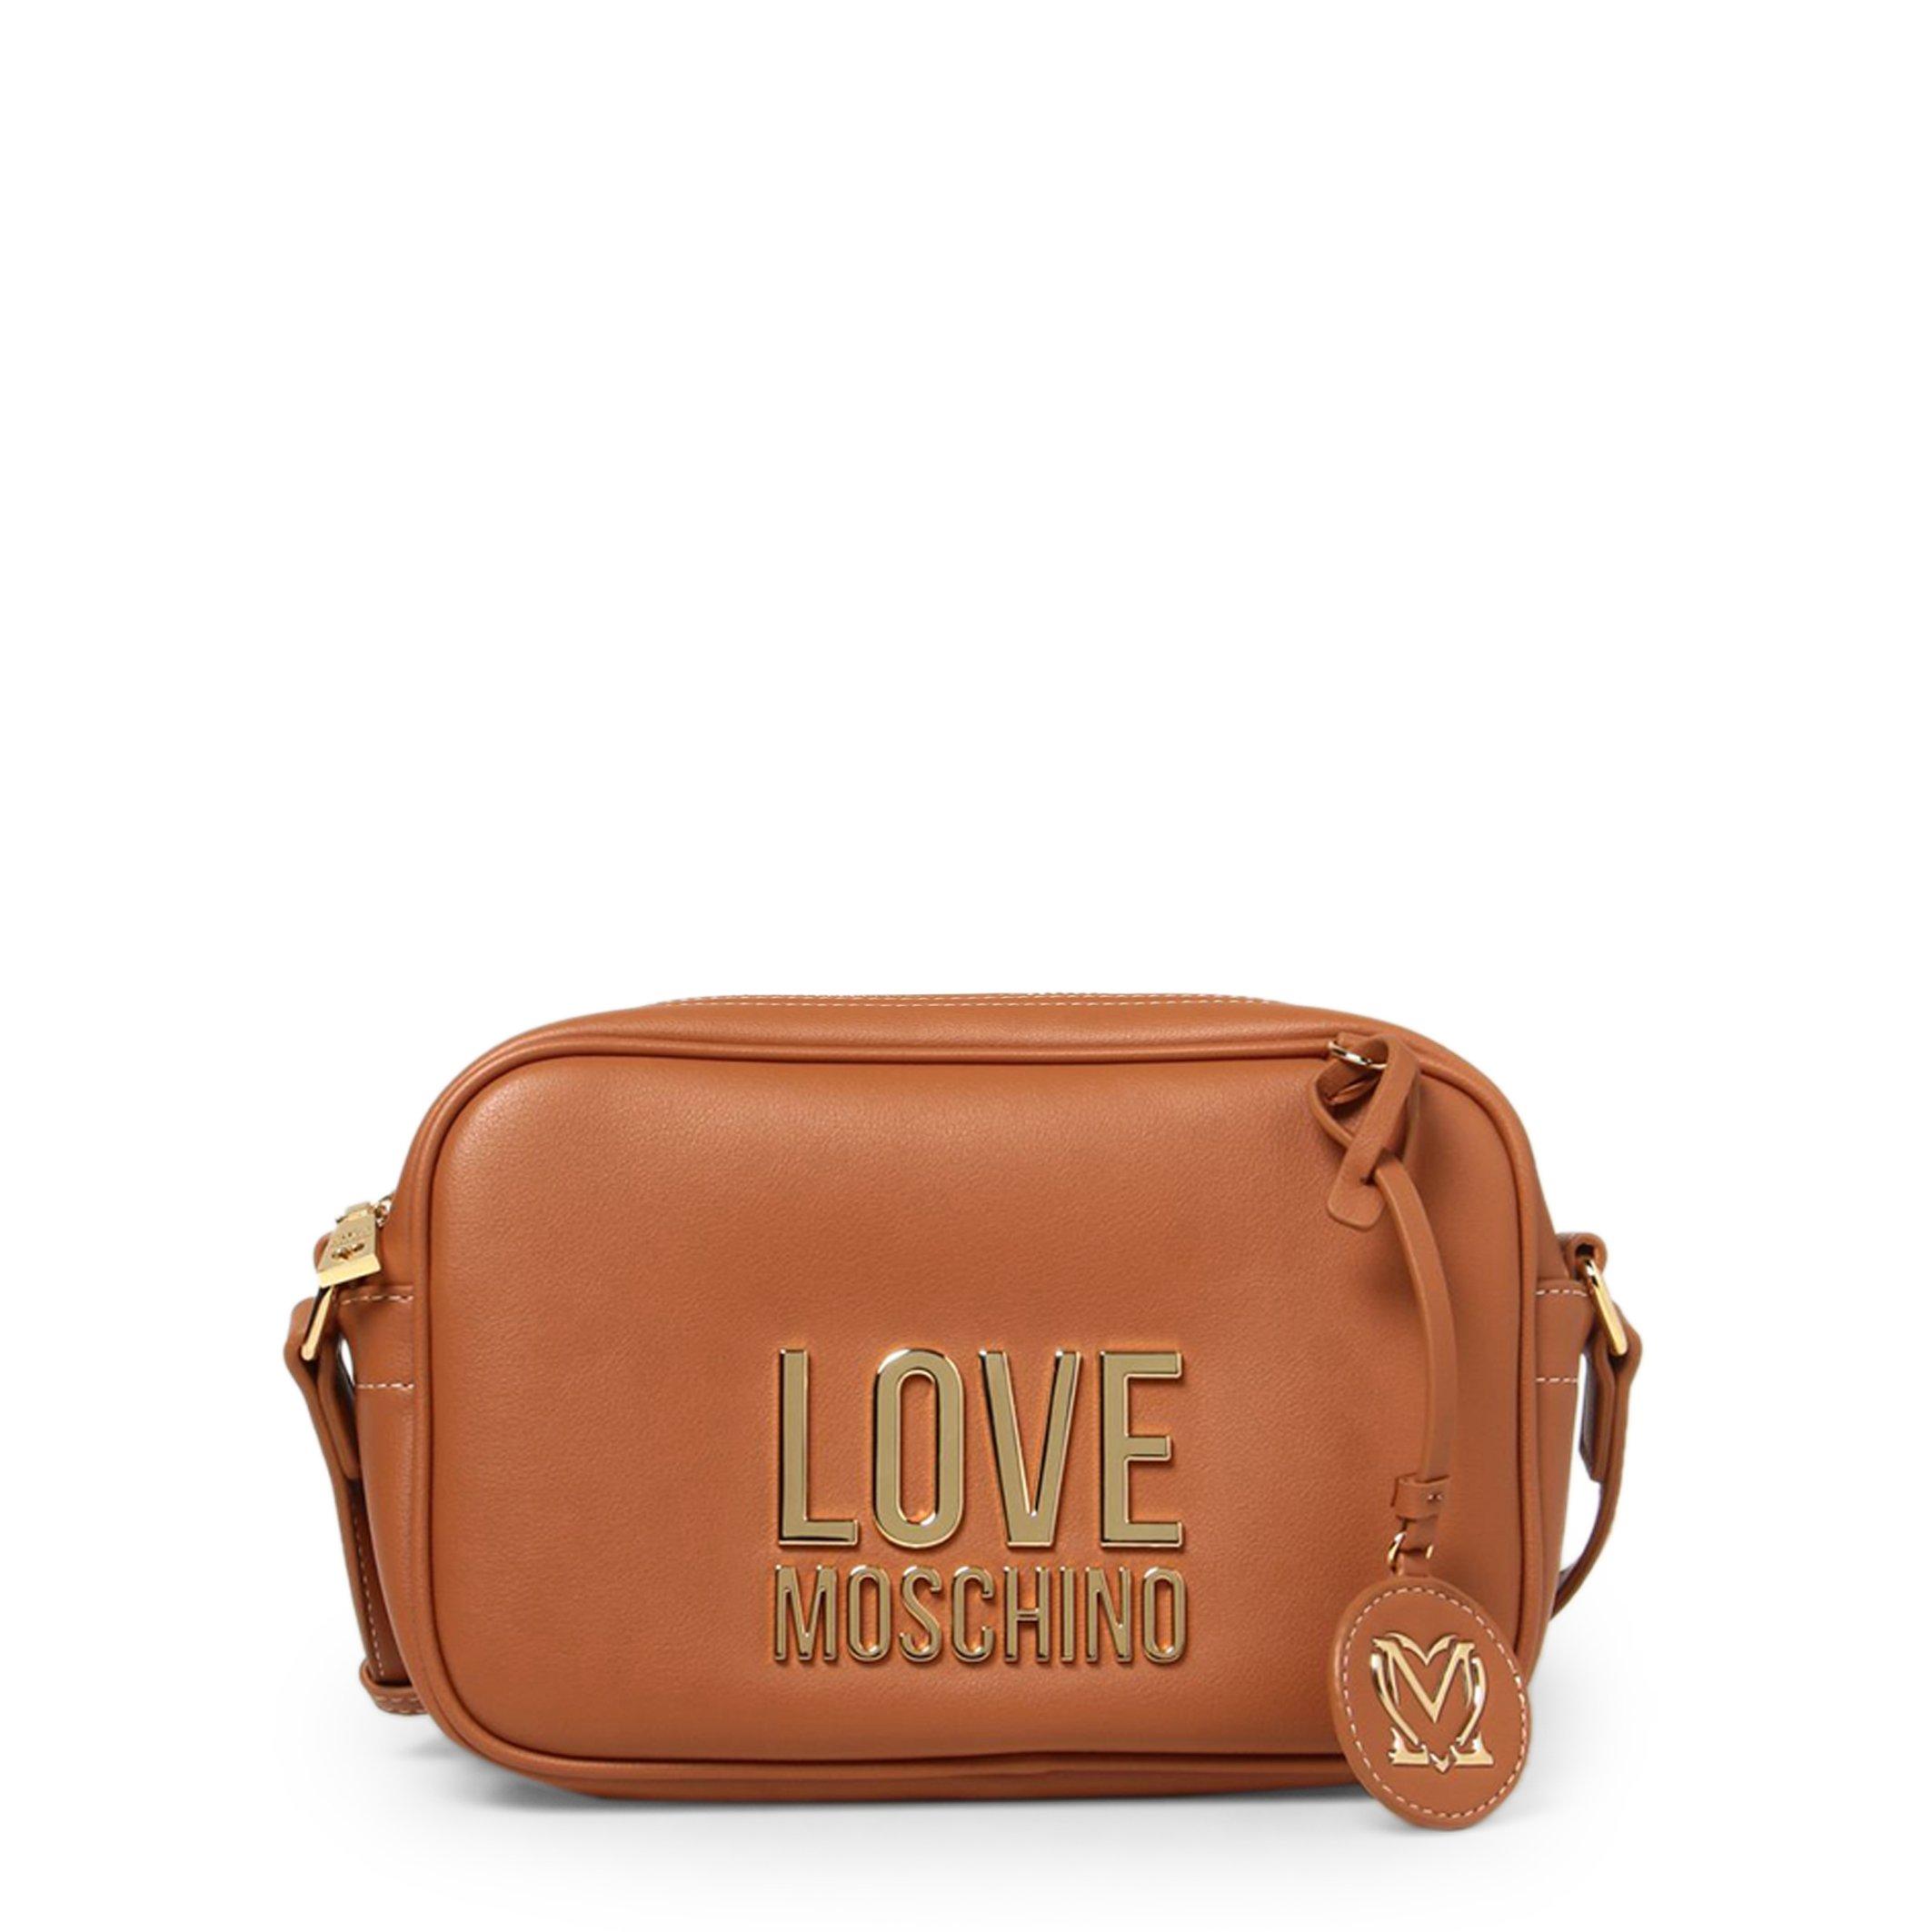 Love Moschino Women's Crossbody Bag Various Colours JC4107PP1DLJ0 - brown NOSIZE